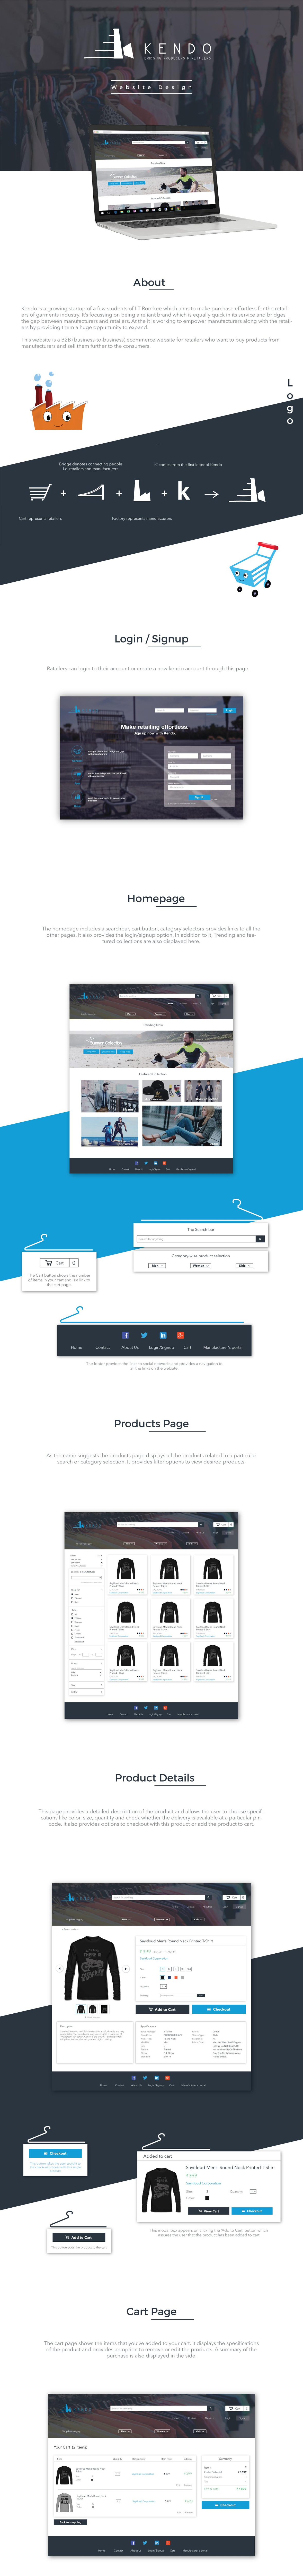 e-commerce UI ux Webdesign UI/UX Website kendo Clothing Garments Retail